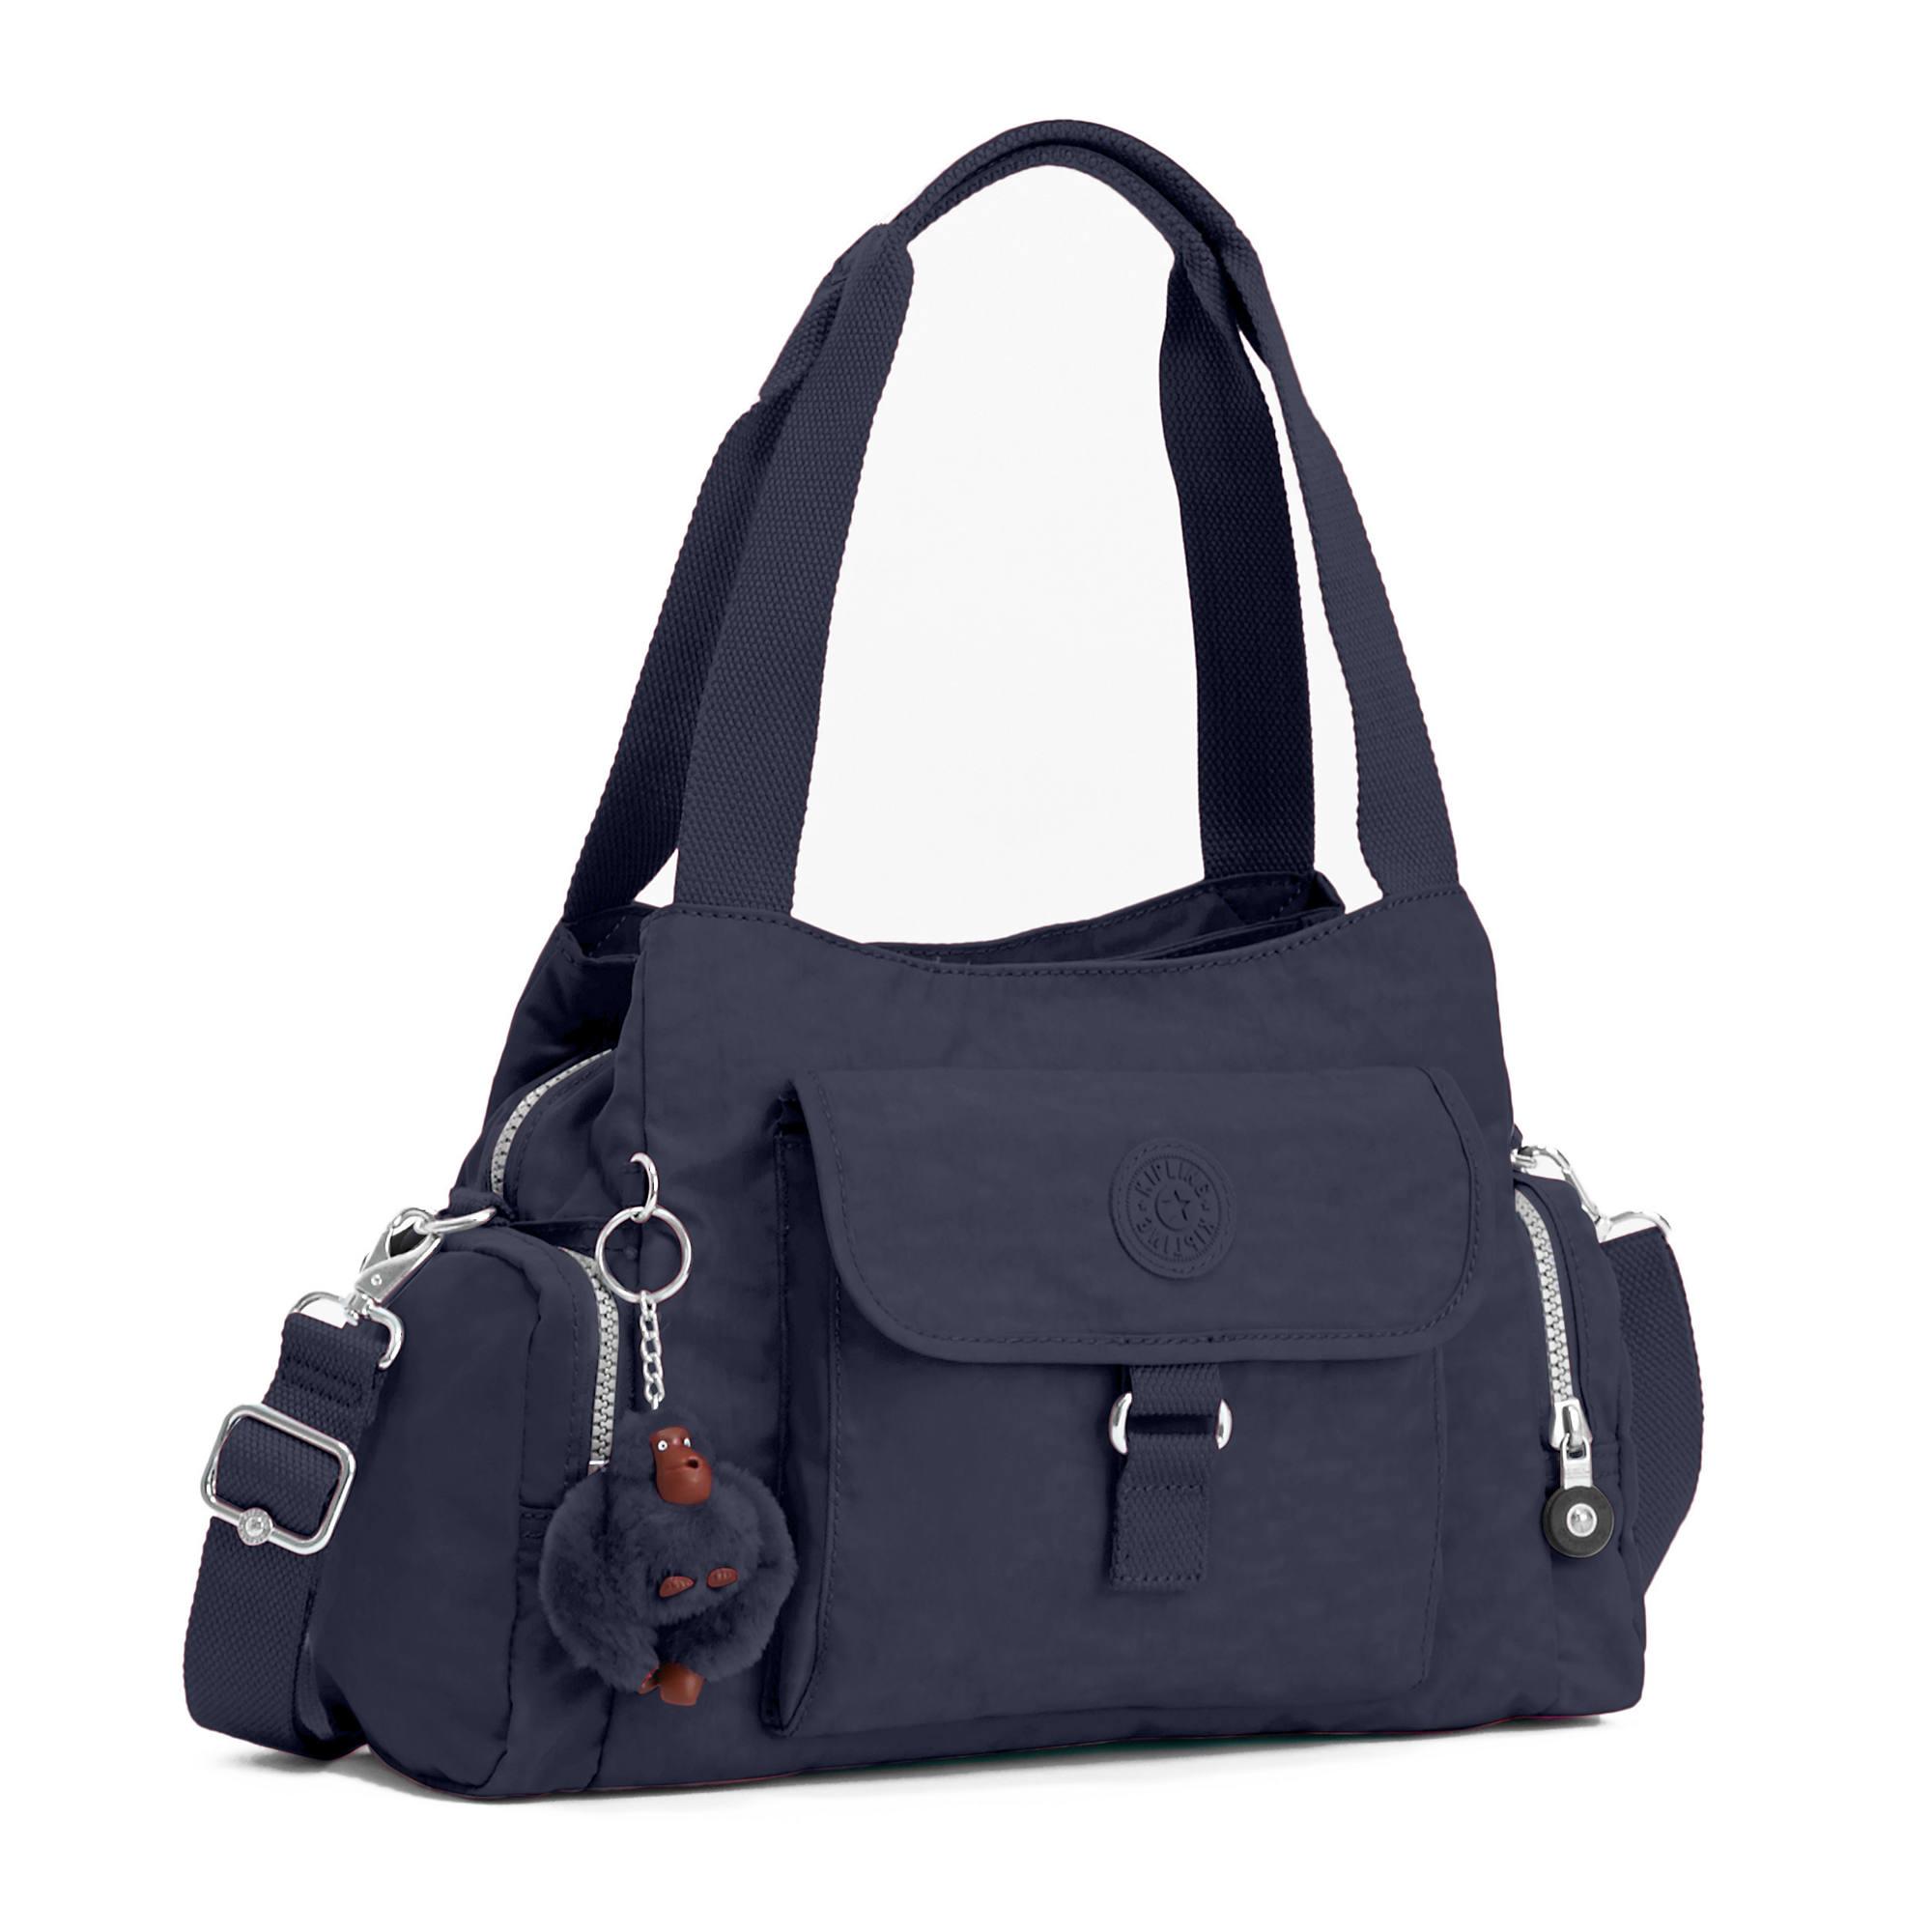 Kipling-Felix-Large-Handbag miniatura 35